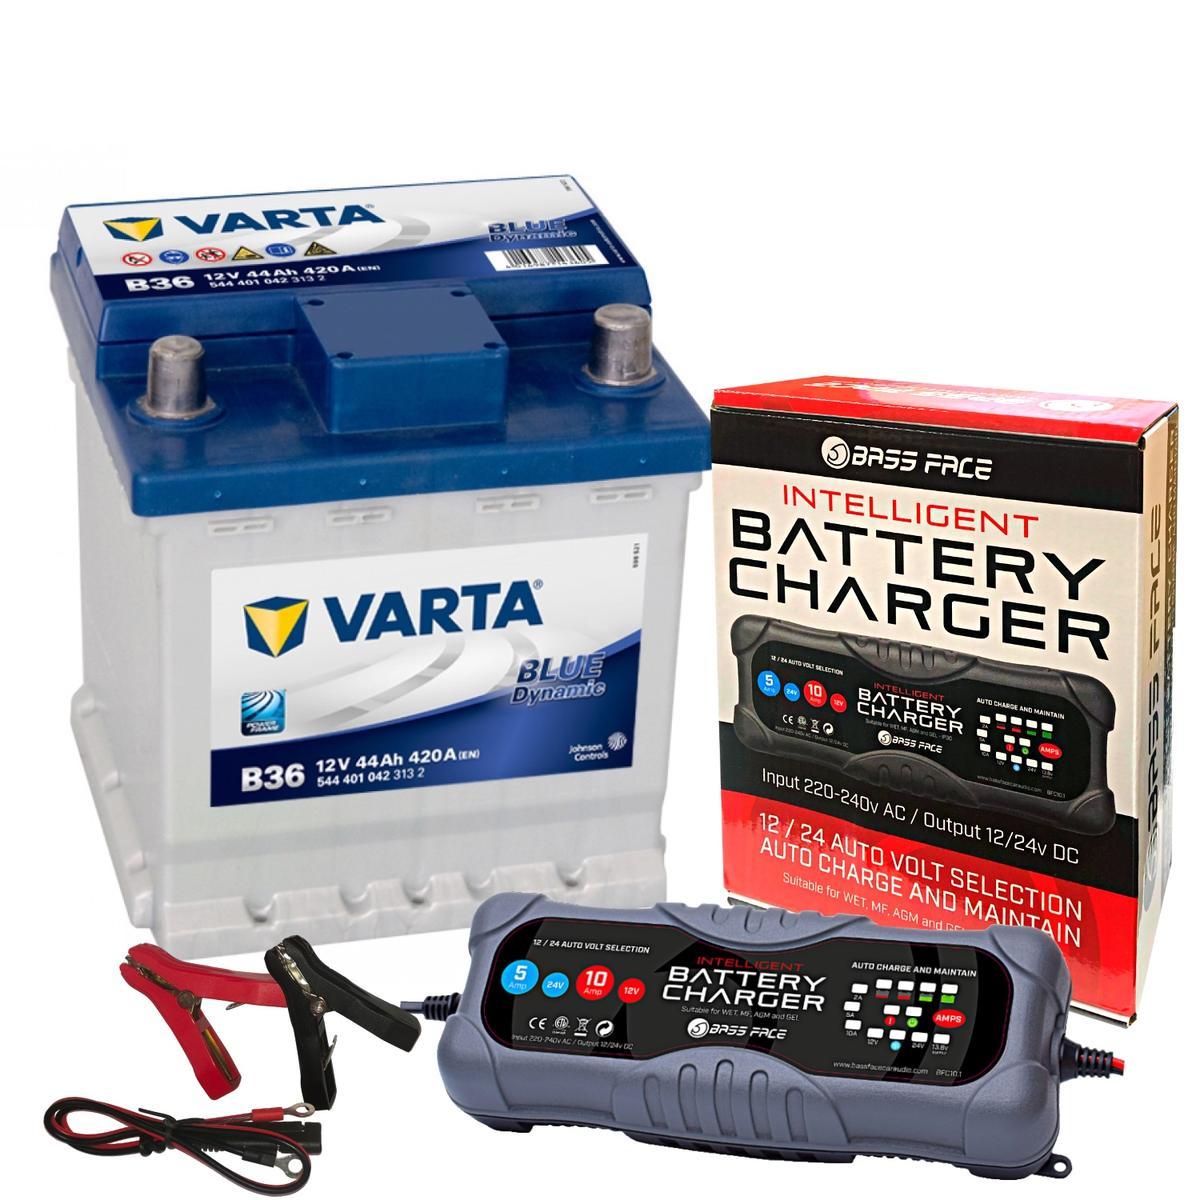 Varta B36 Fiat Car Battery 12v 4 Year 202 / 002L 44Ah 420CCA W/ 10 Amp Charger